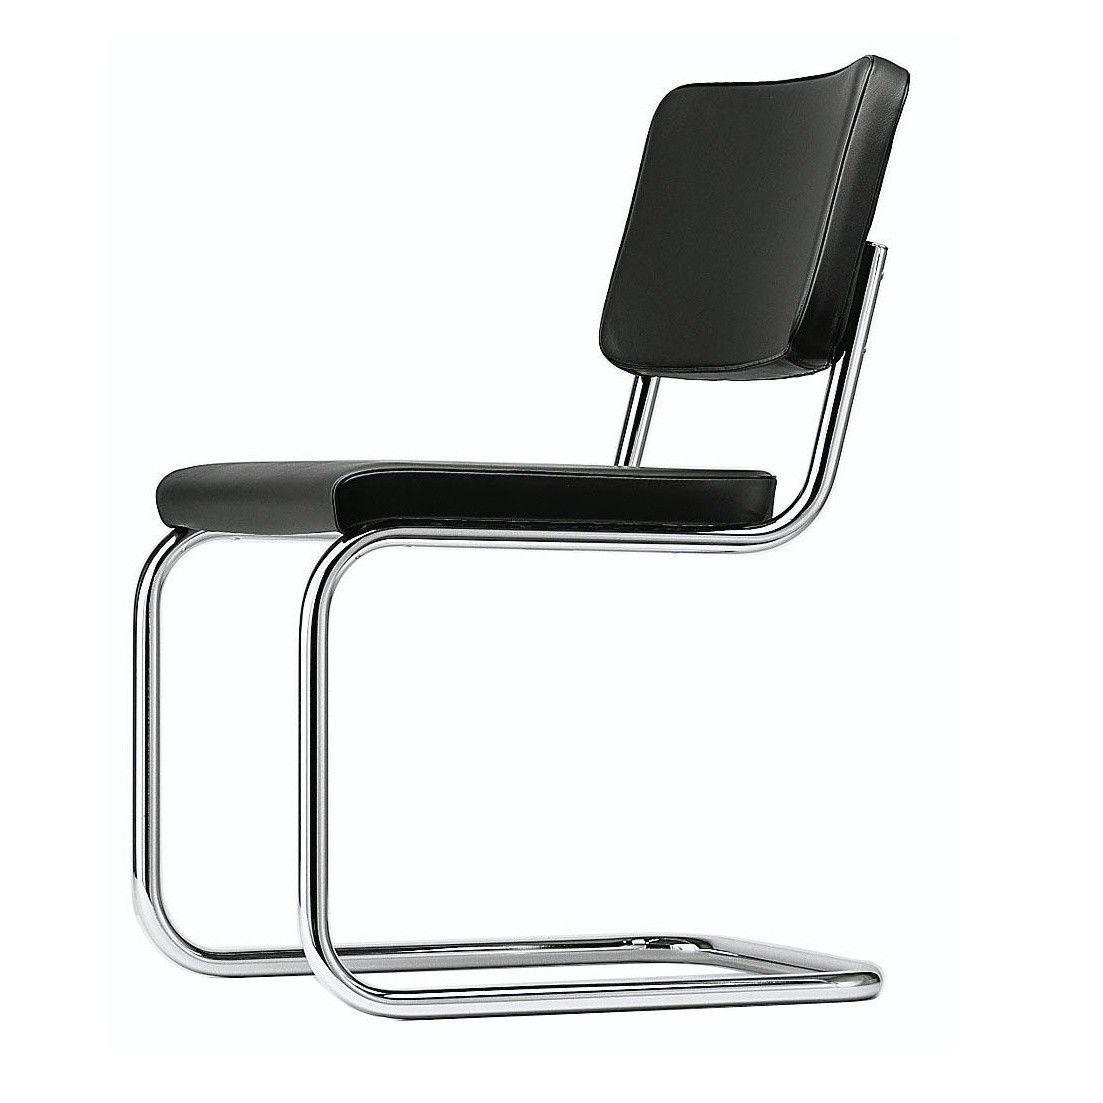 Thonet s 32 cantilever chair thonet novelties for Marcel breuer stuhl nachbau